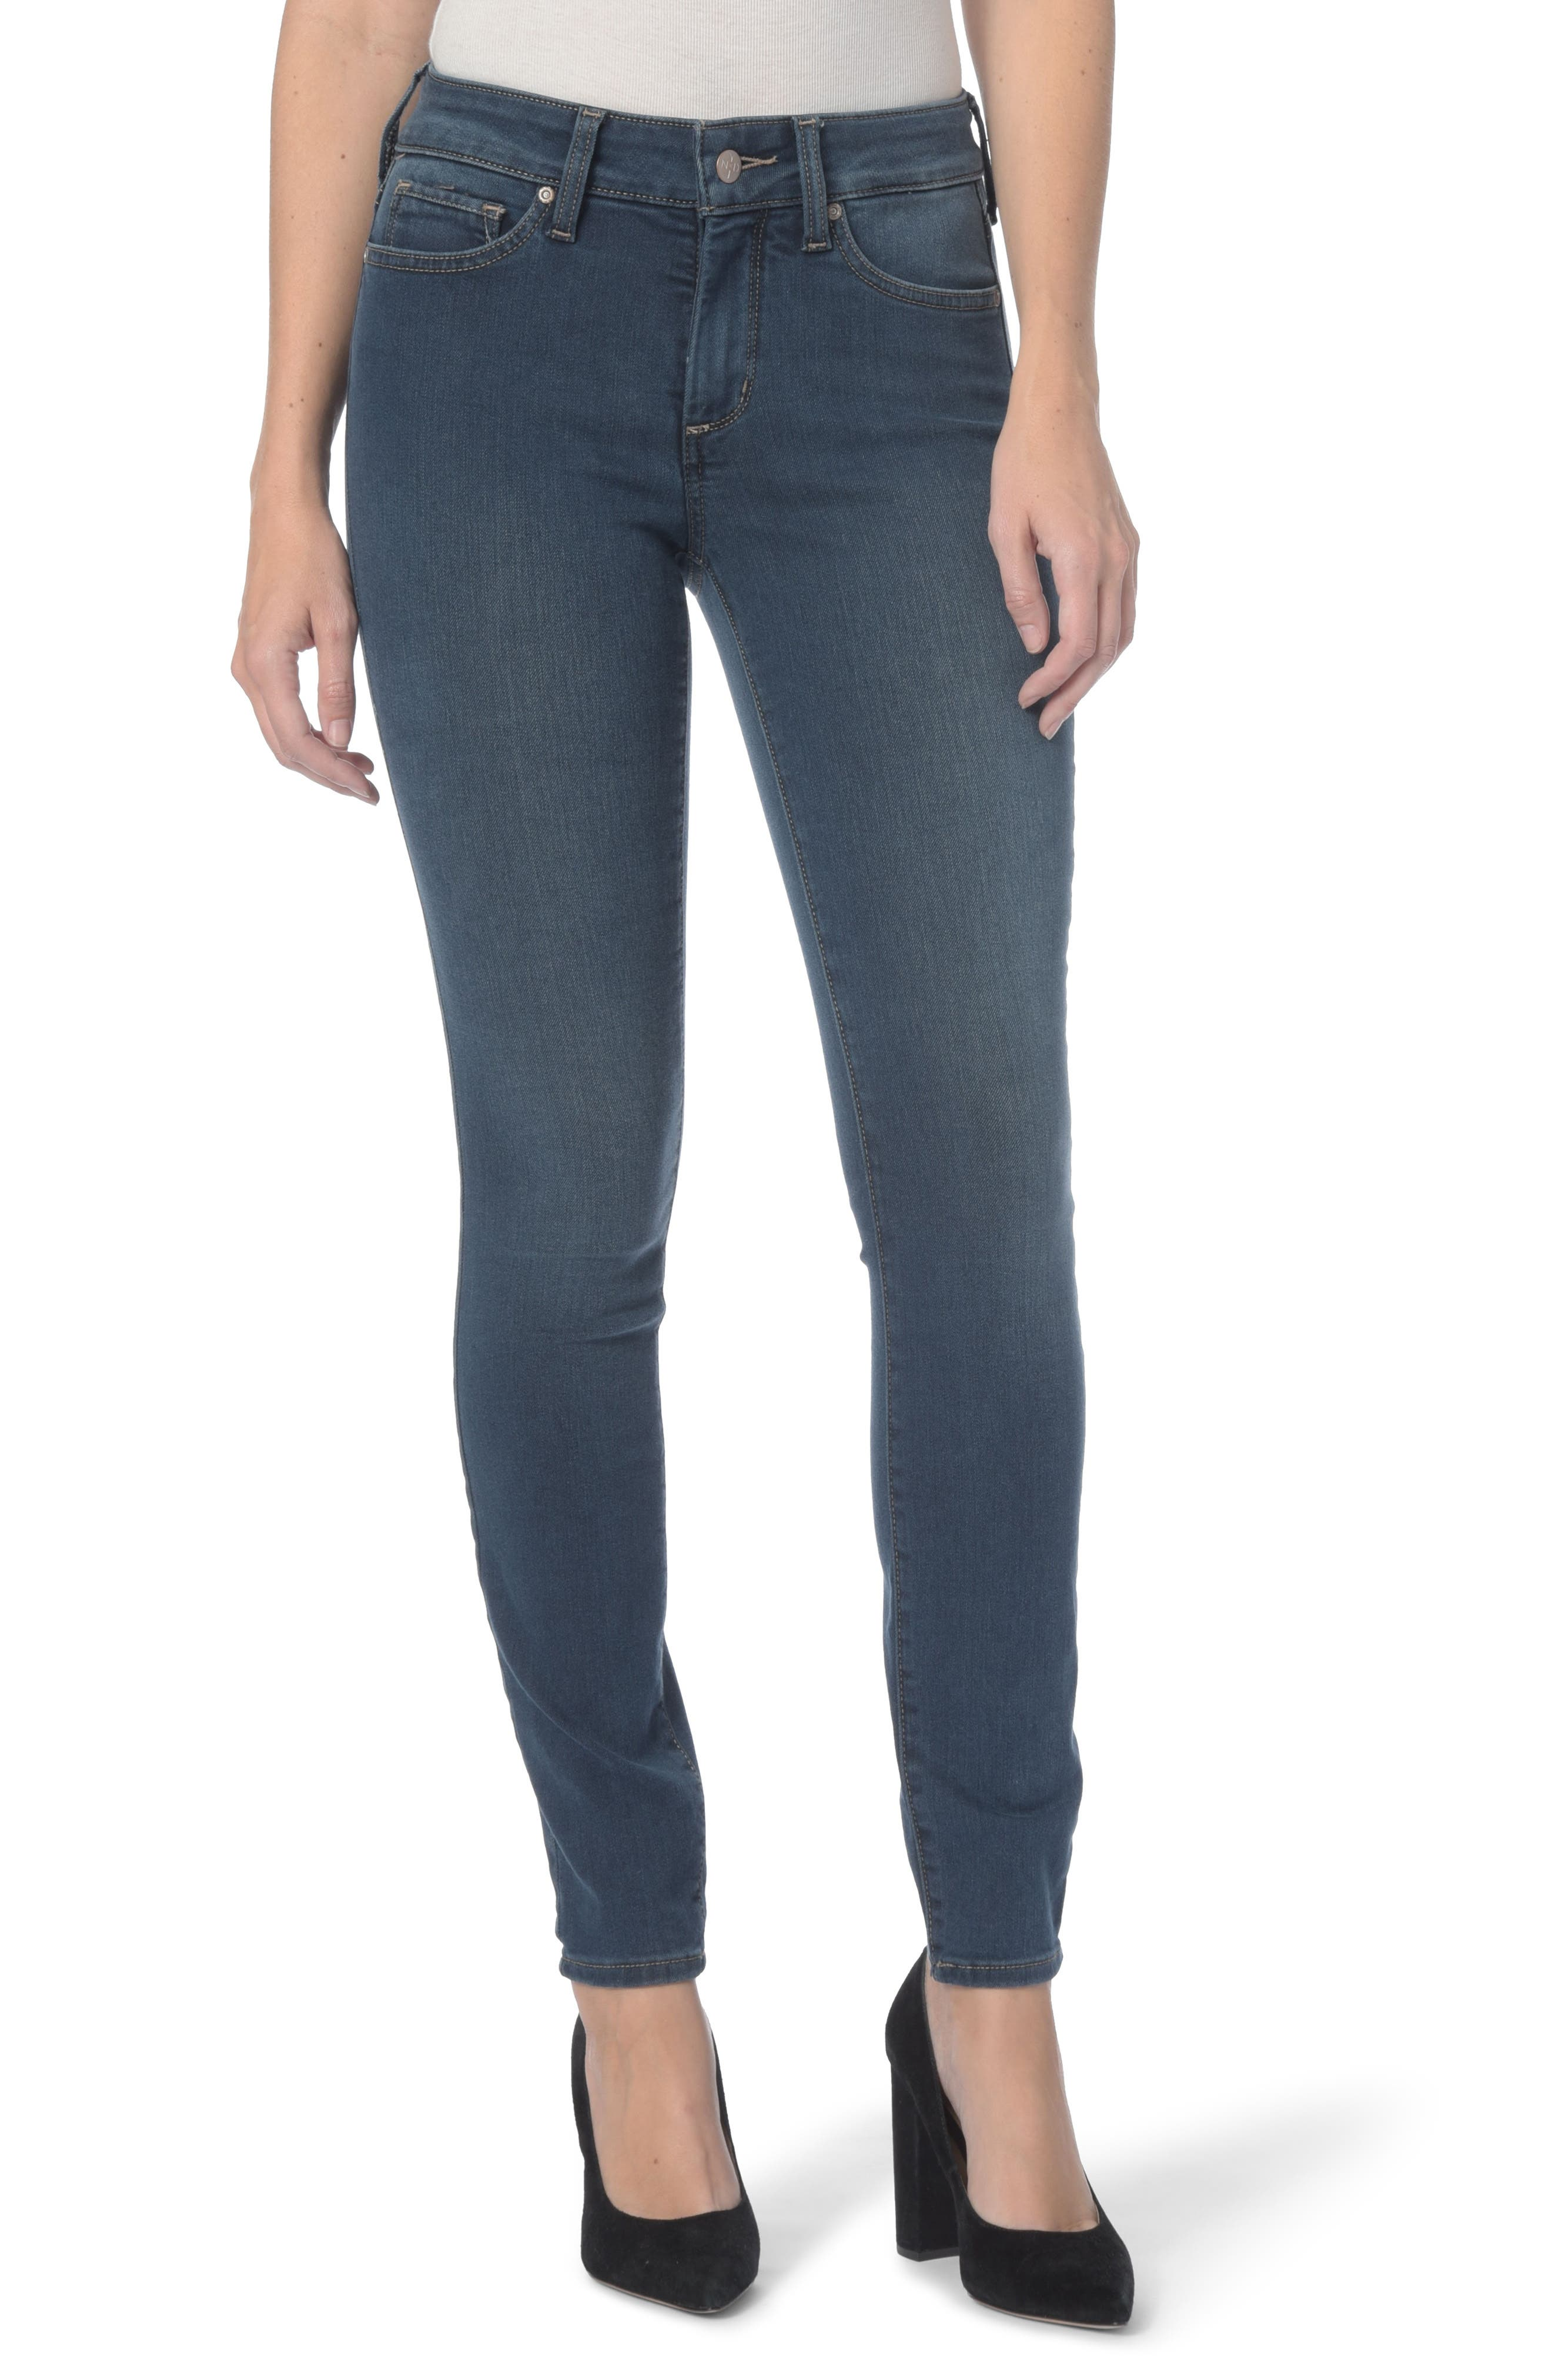 Main Image - NYDJ Ami Stretch Super Skinny Jeans (Rome) (Regular & Petite)